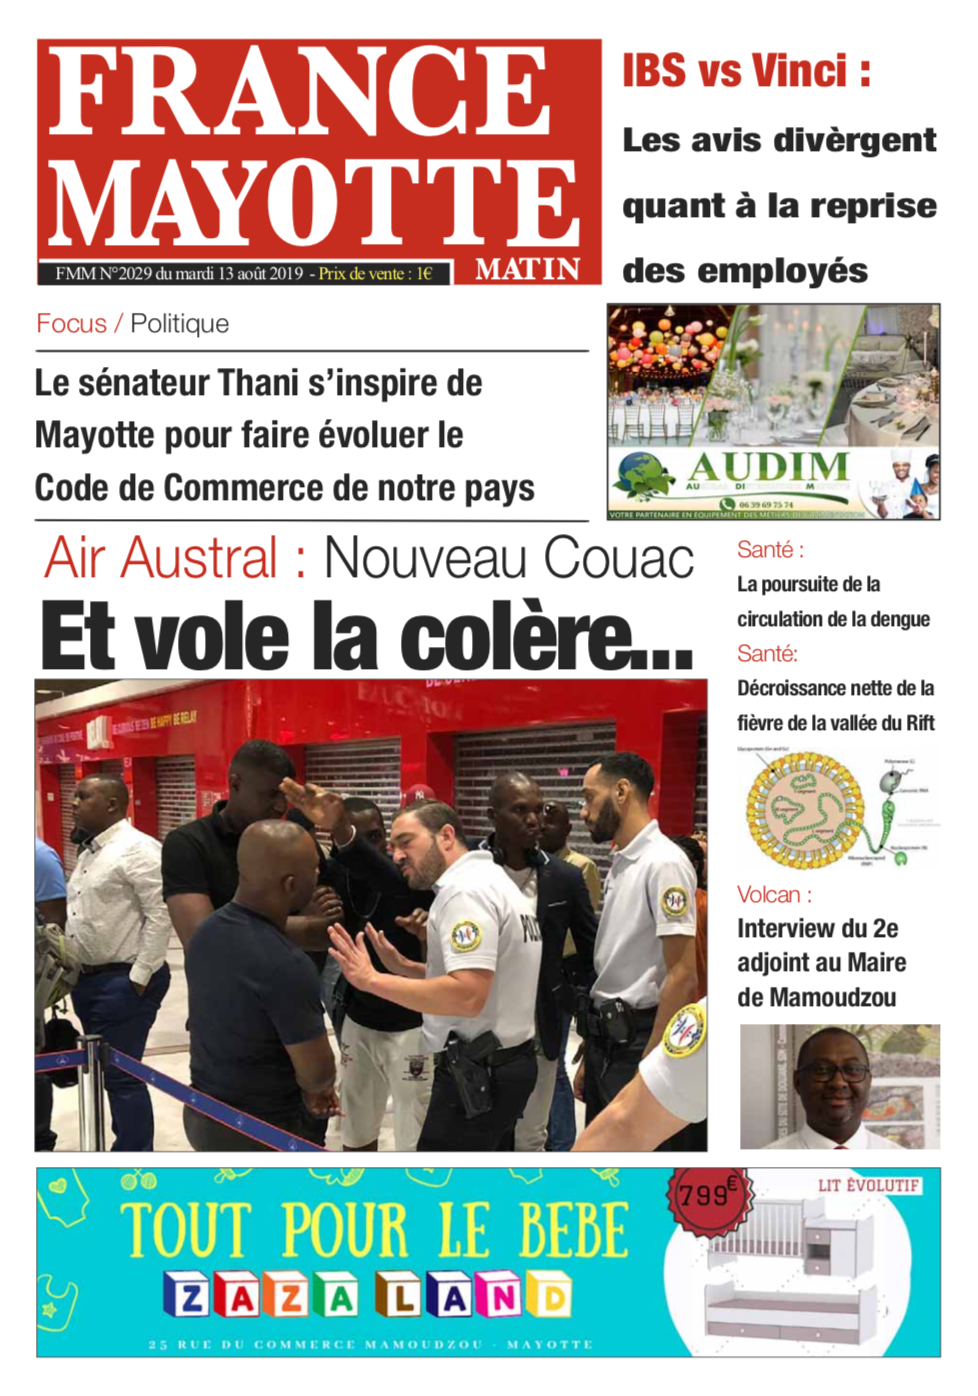 France Mayotte Mardi 13 août 2019